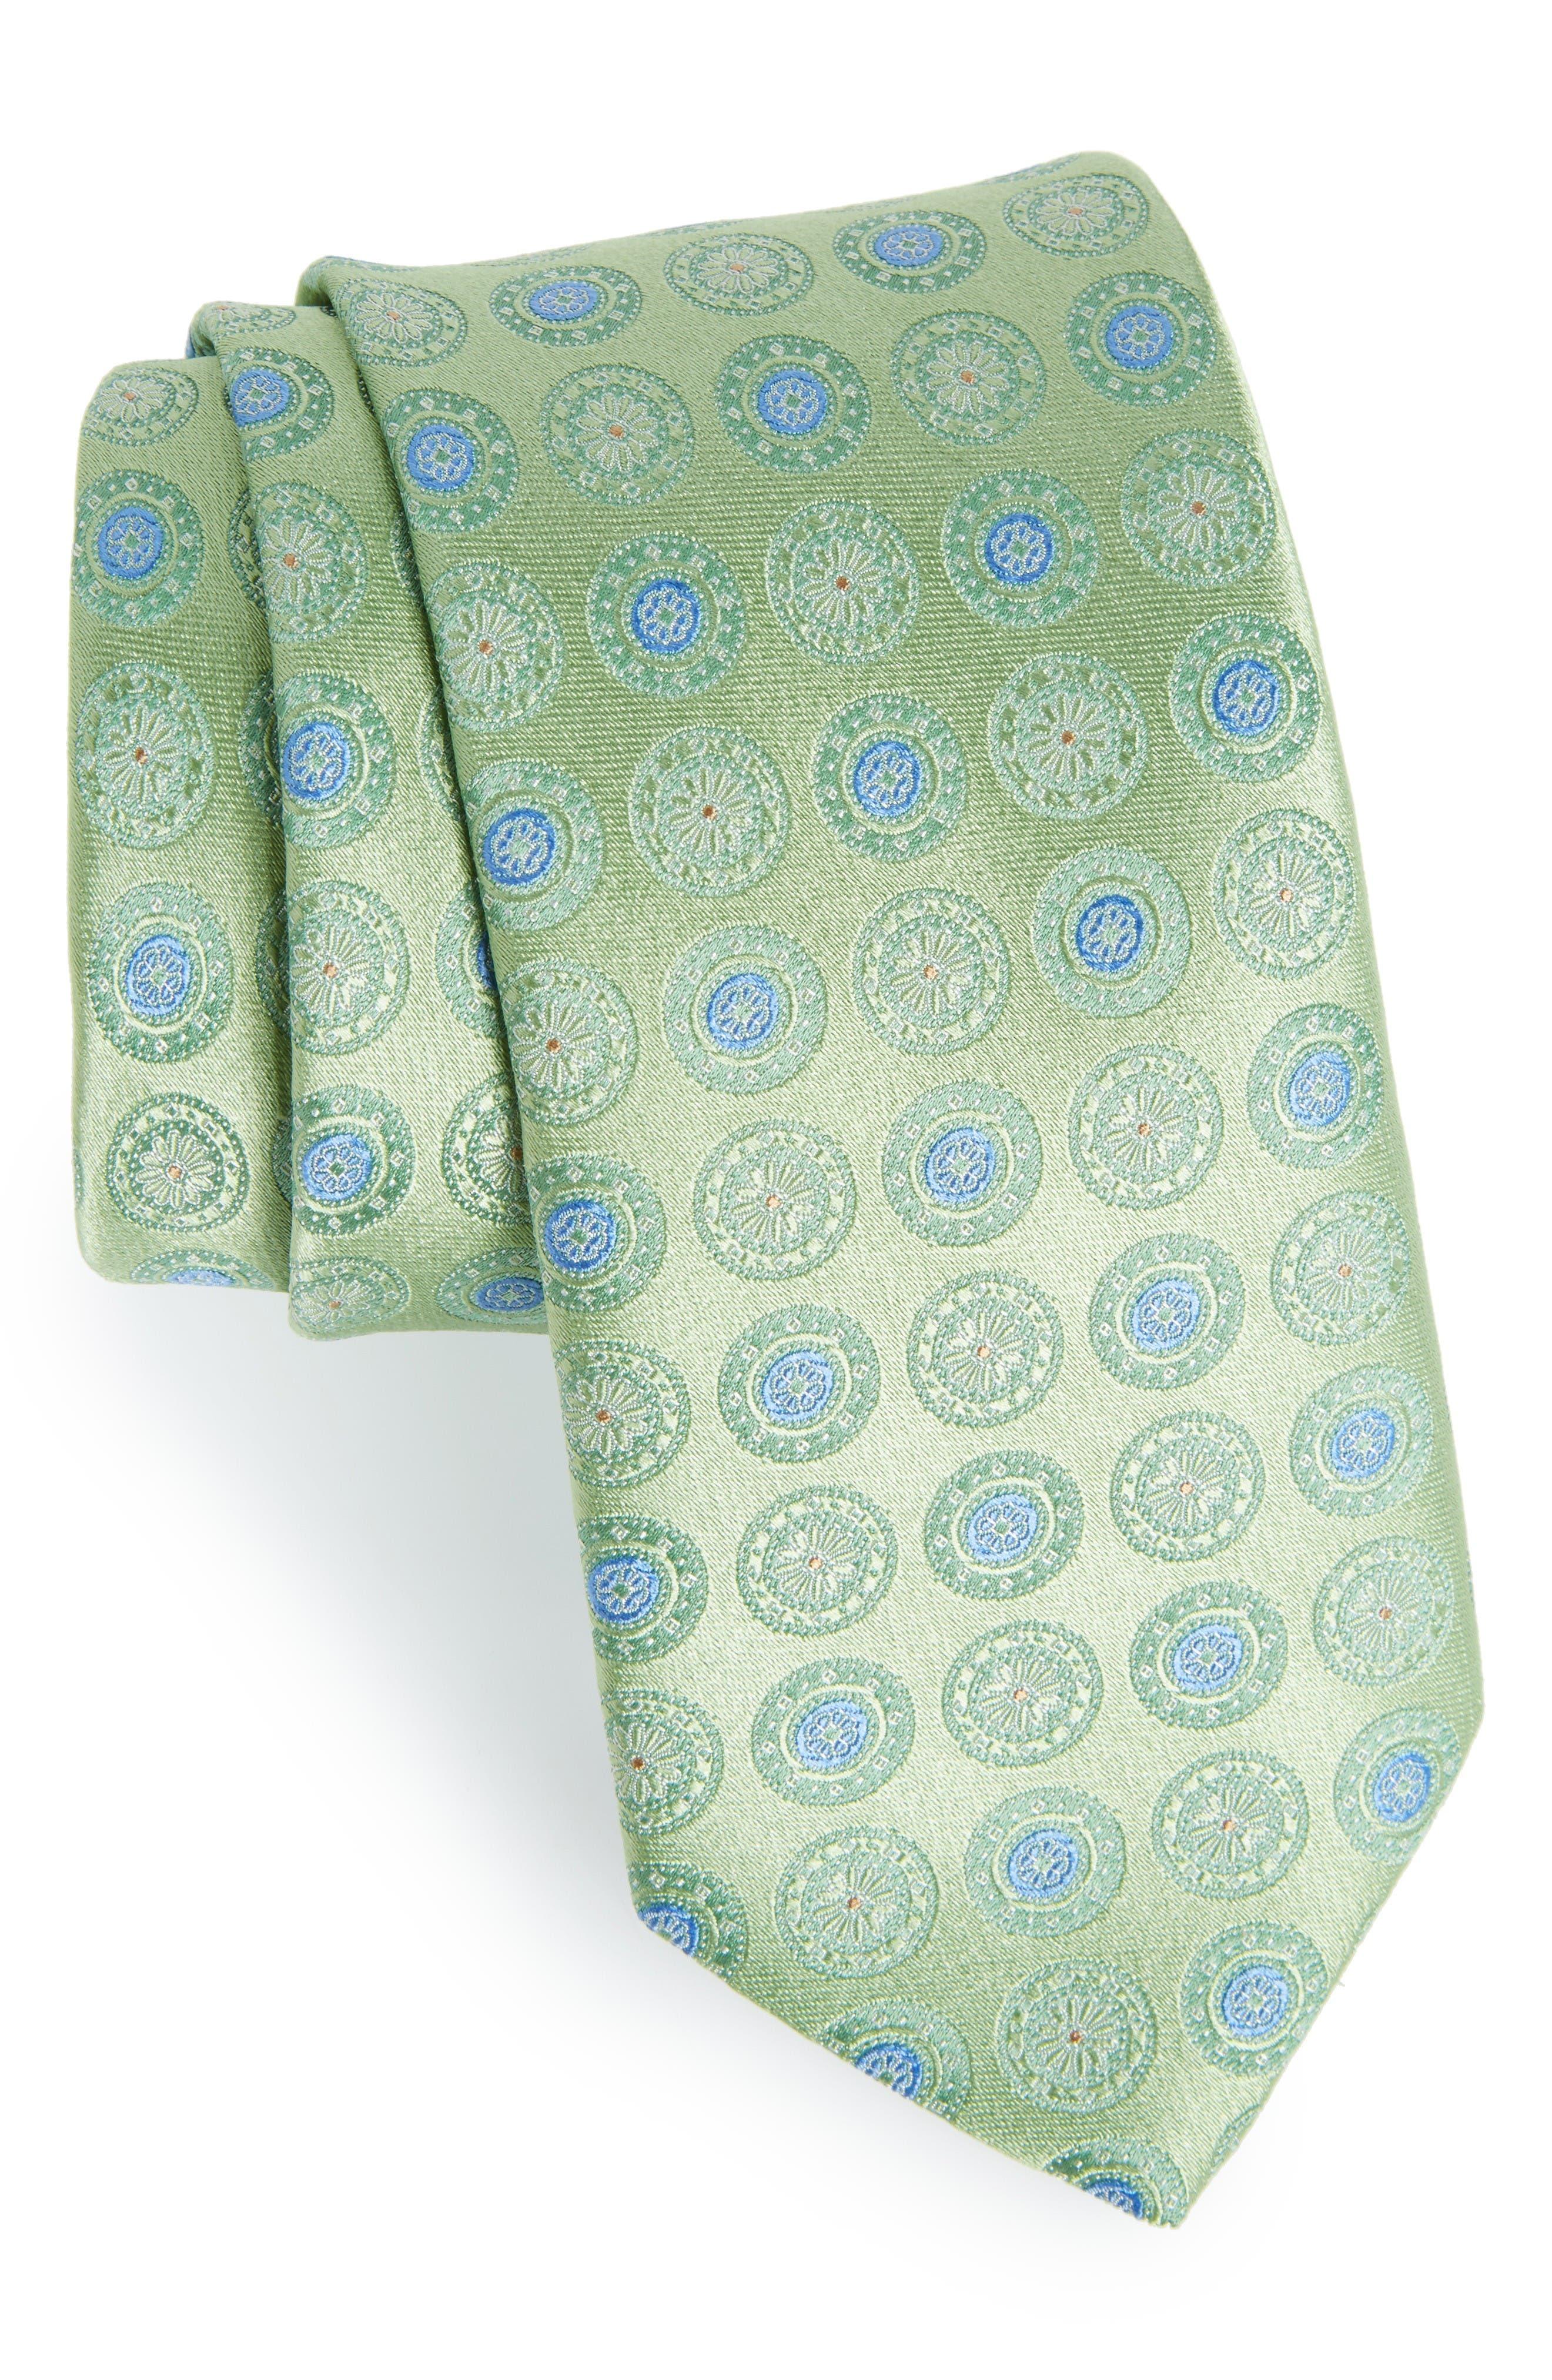 Main Image - John W. Nordstrom® Medallion Silk Tie